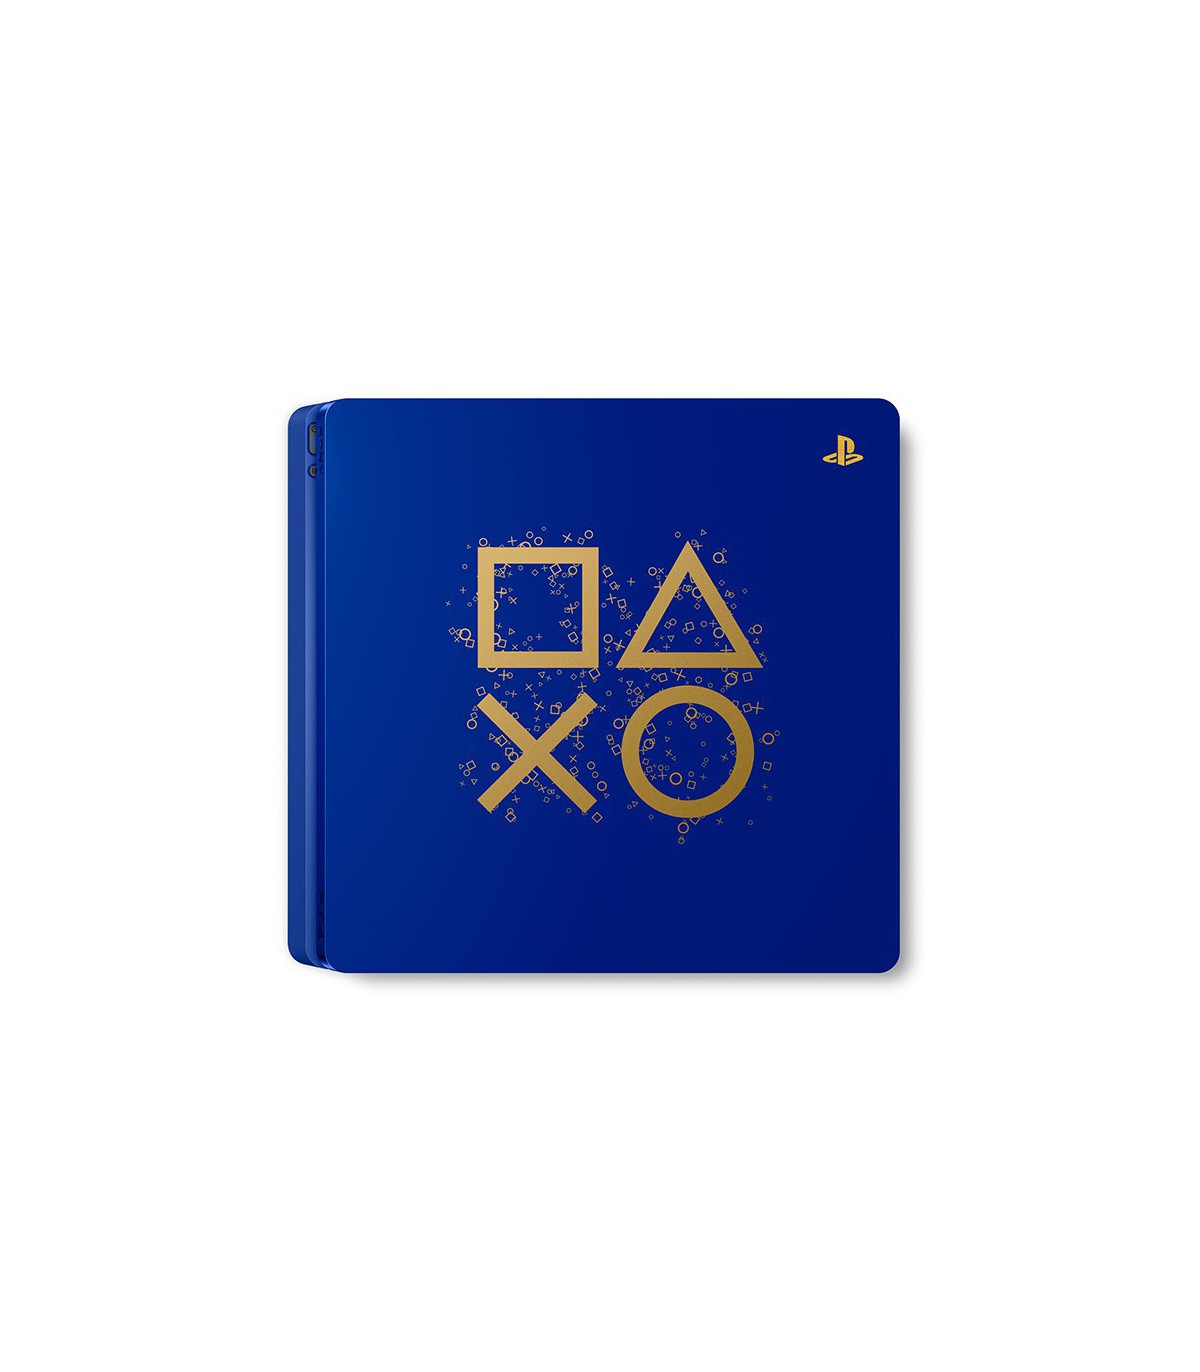 کنسول پلی استیشن 4 اسلیم slim 500 gb bundle days of play limited edition